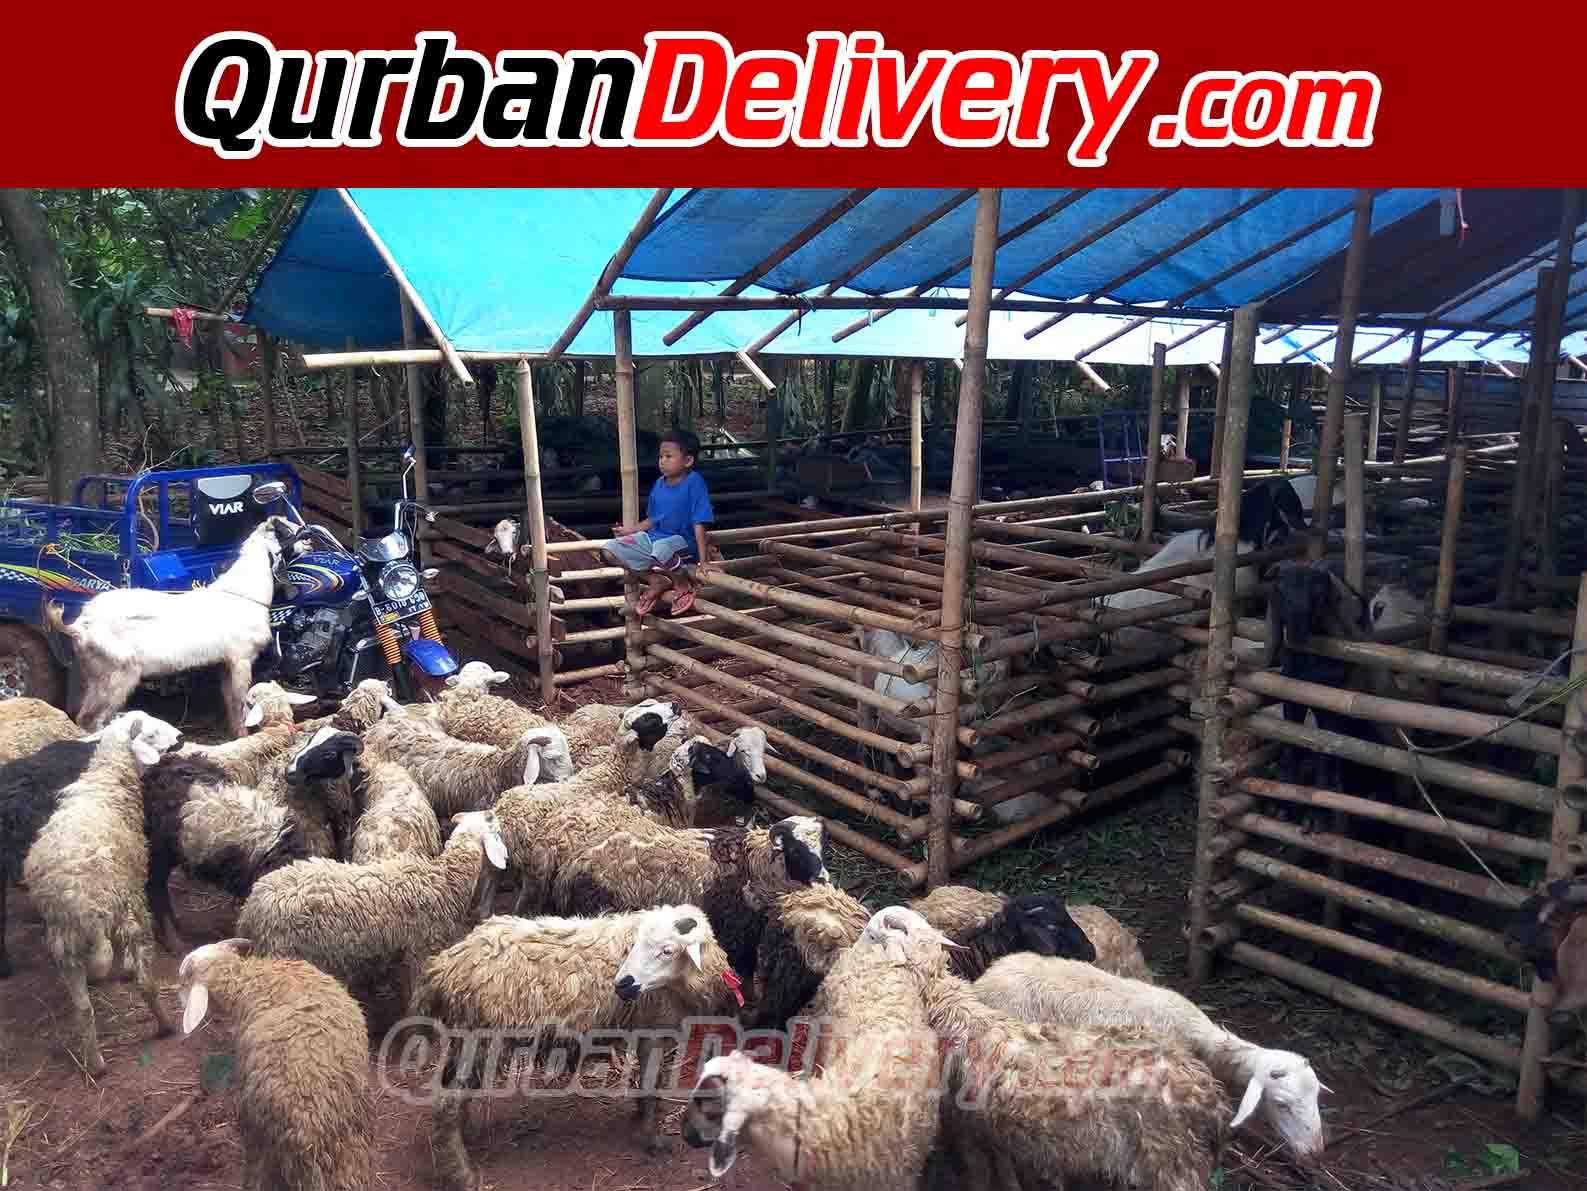 Harga Kambing Qurban Di Jakarta Prediksi 2020-Qurban Delivery